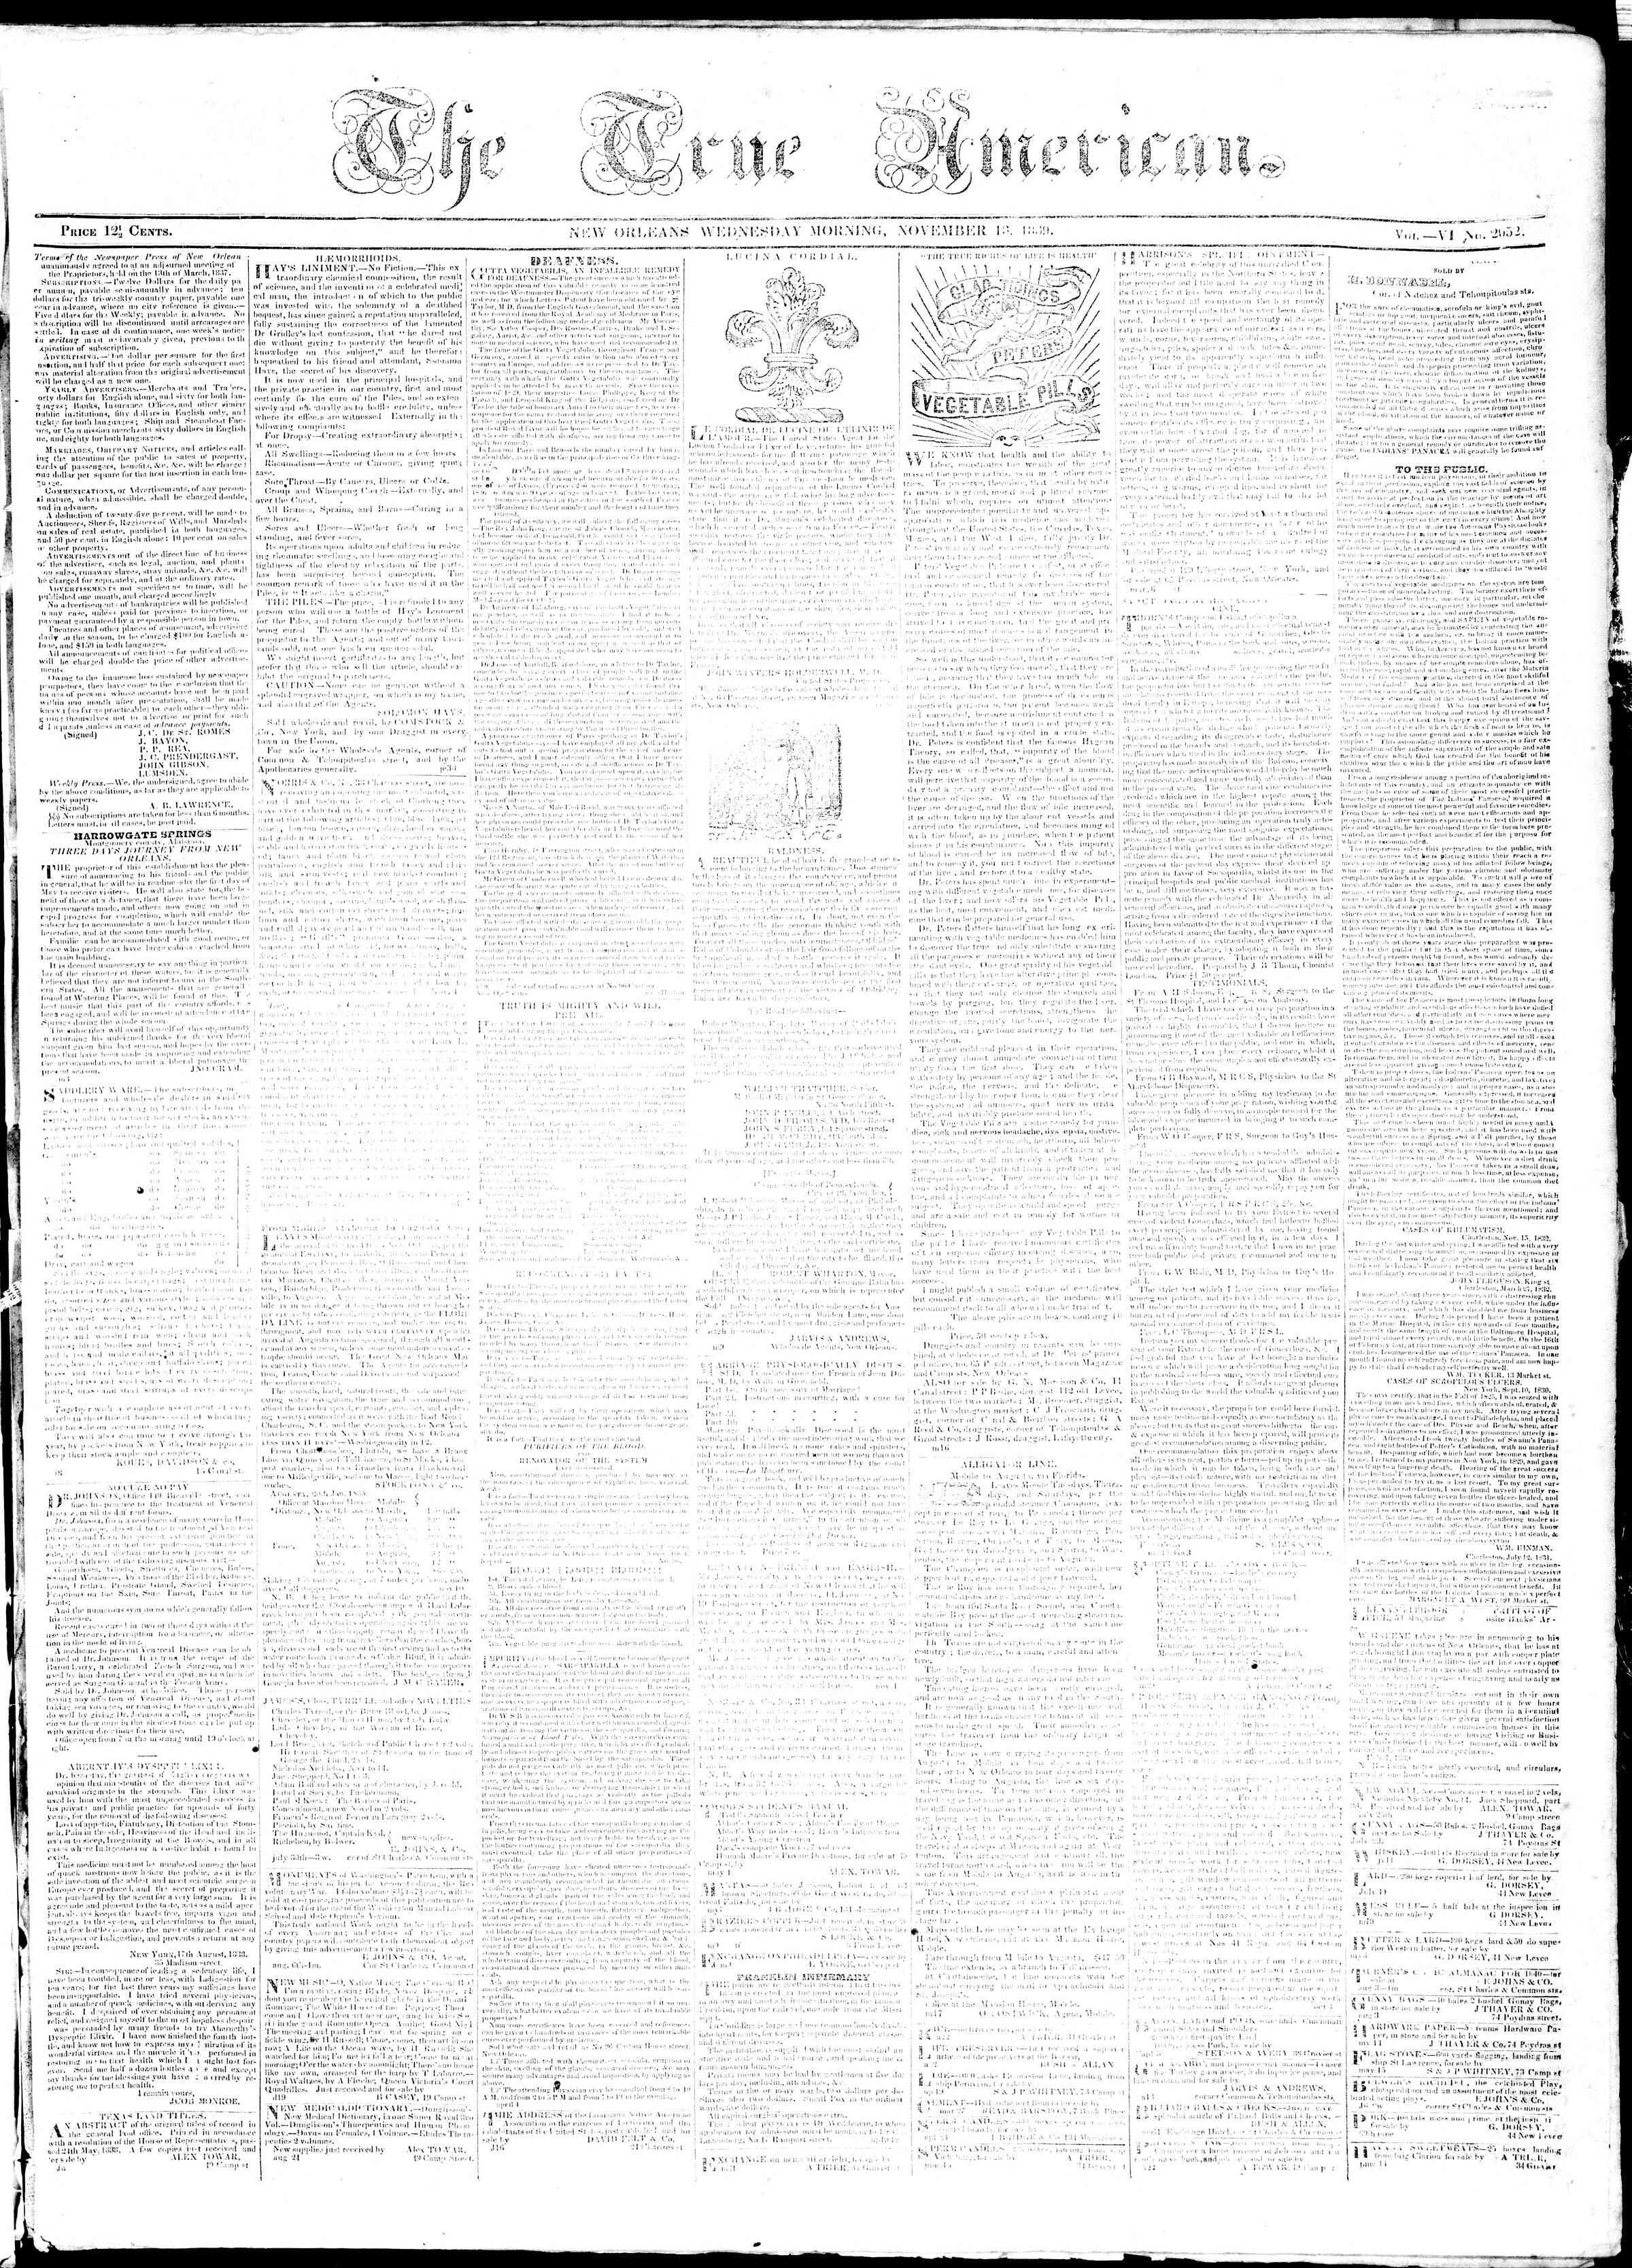 November 13, 1839 Tarihli True American Gazetesi Sayfa 1